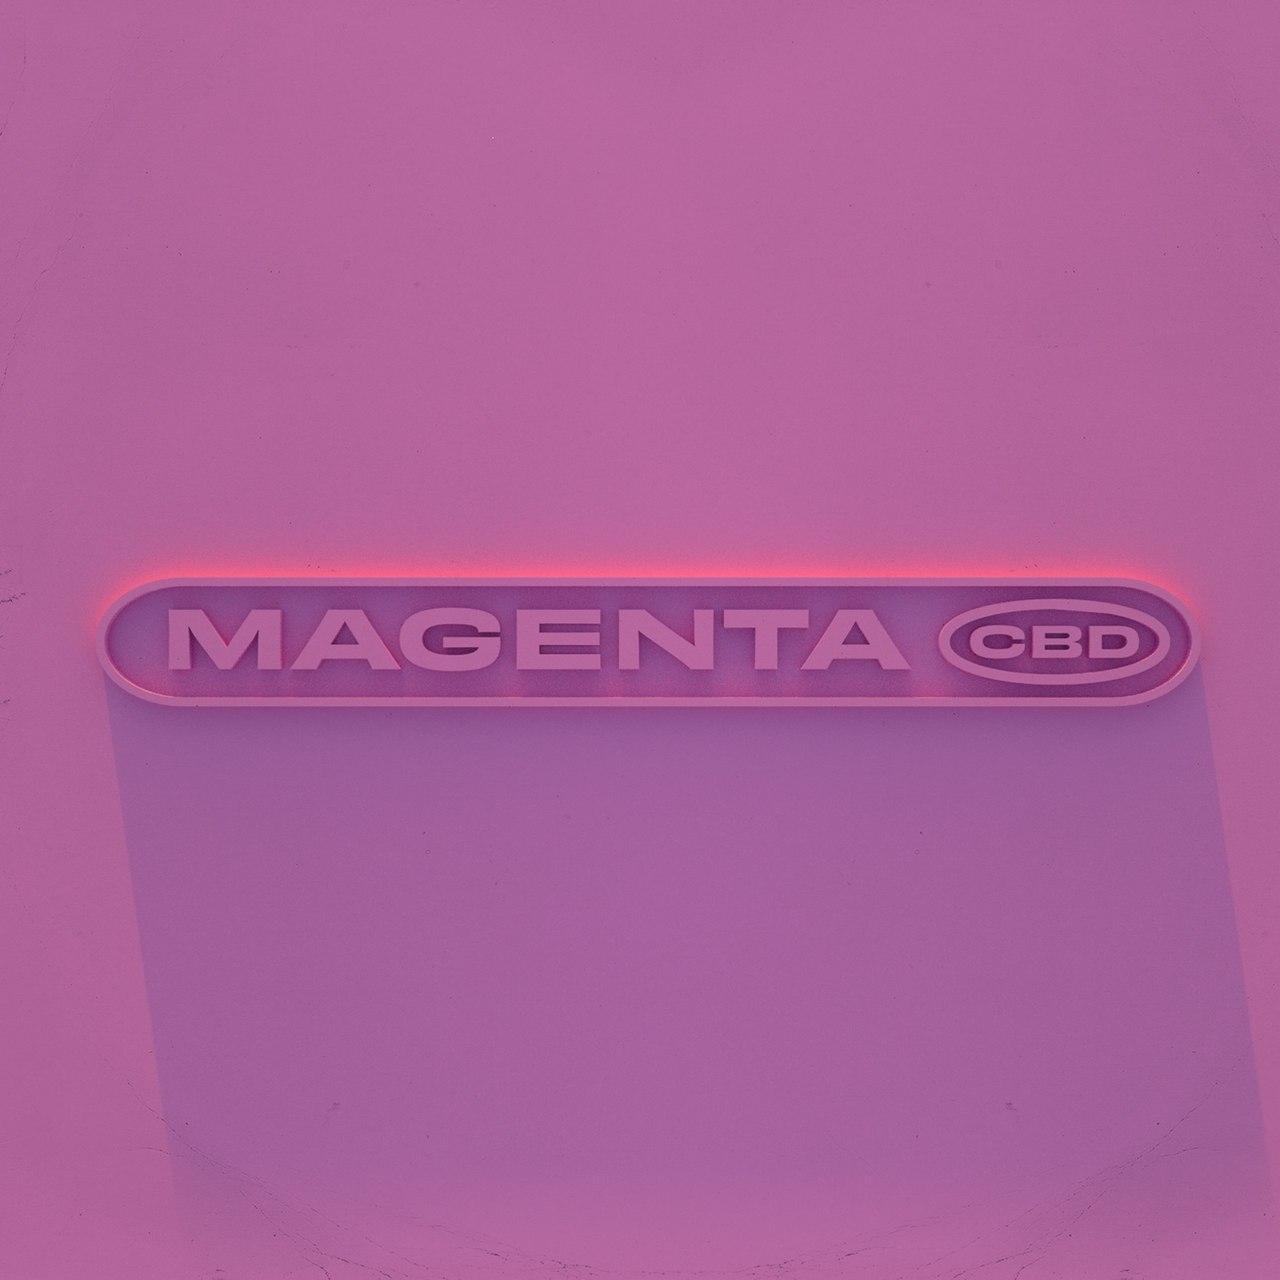 Magenta CBD